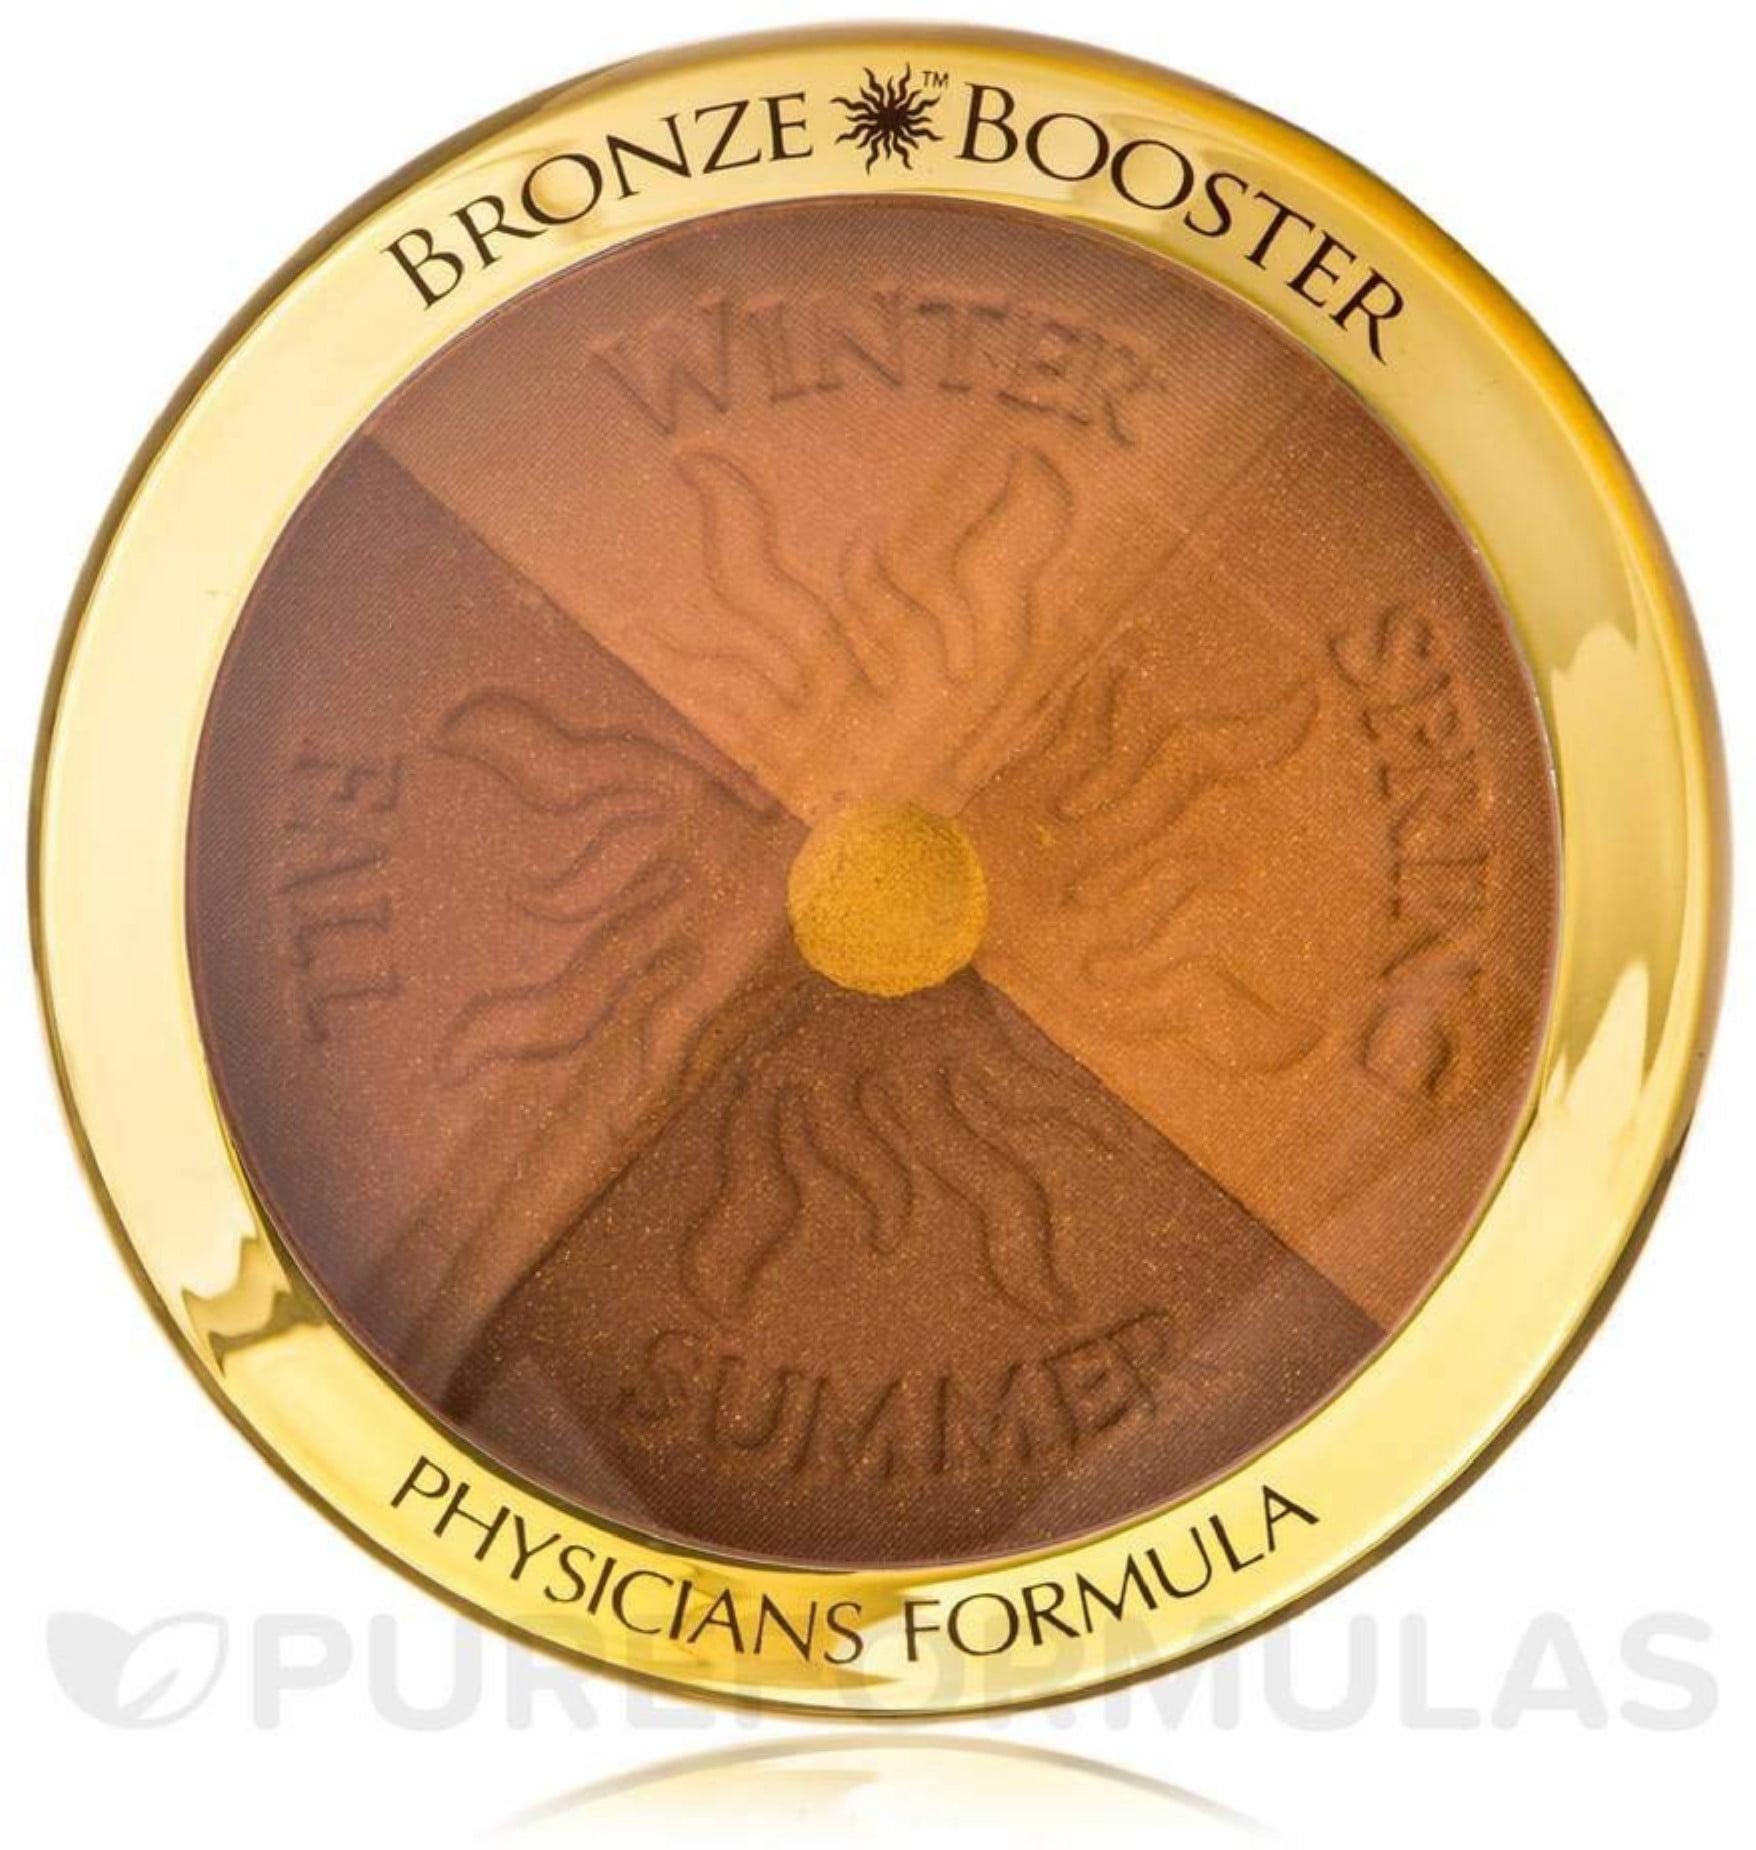 2 Pack - Physician's Formula Bronze Booster Glow-Boosting Season-To-Season Bronzer, Medium to Dark 0.30 oz